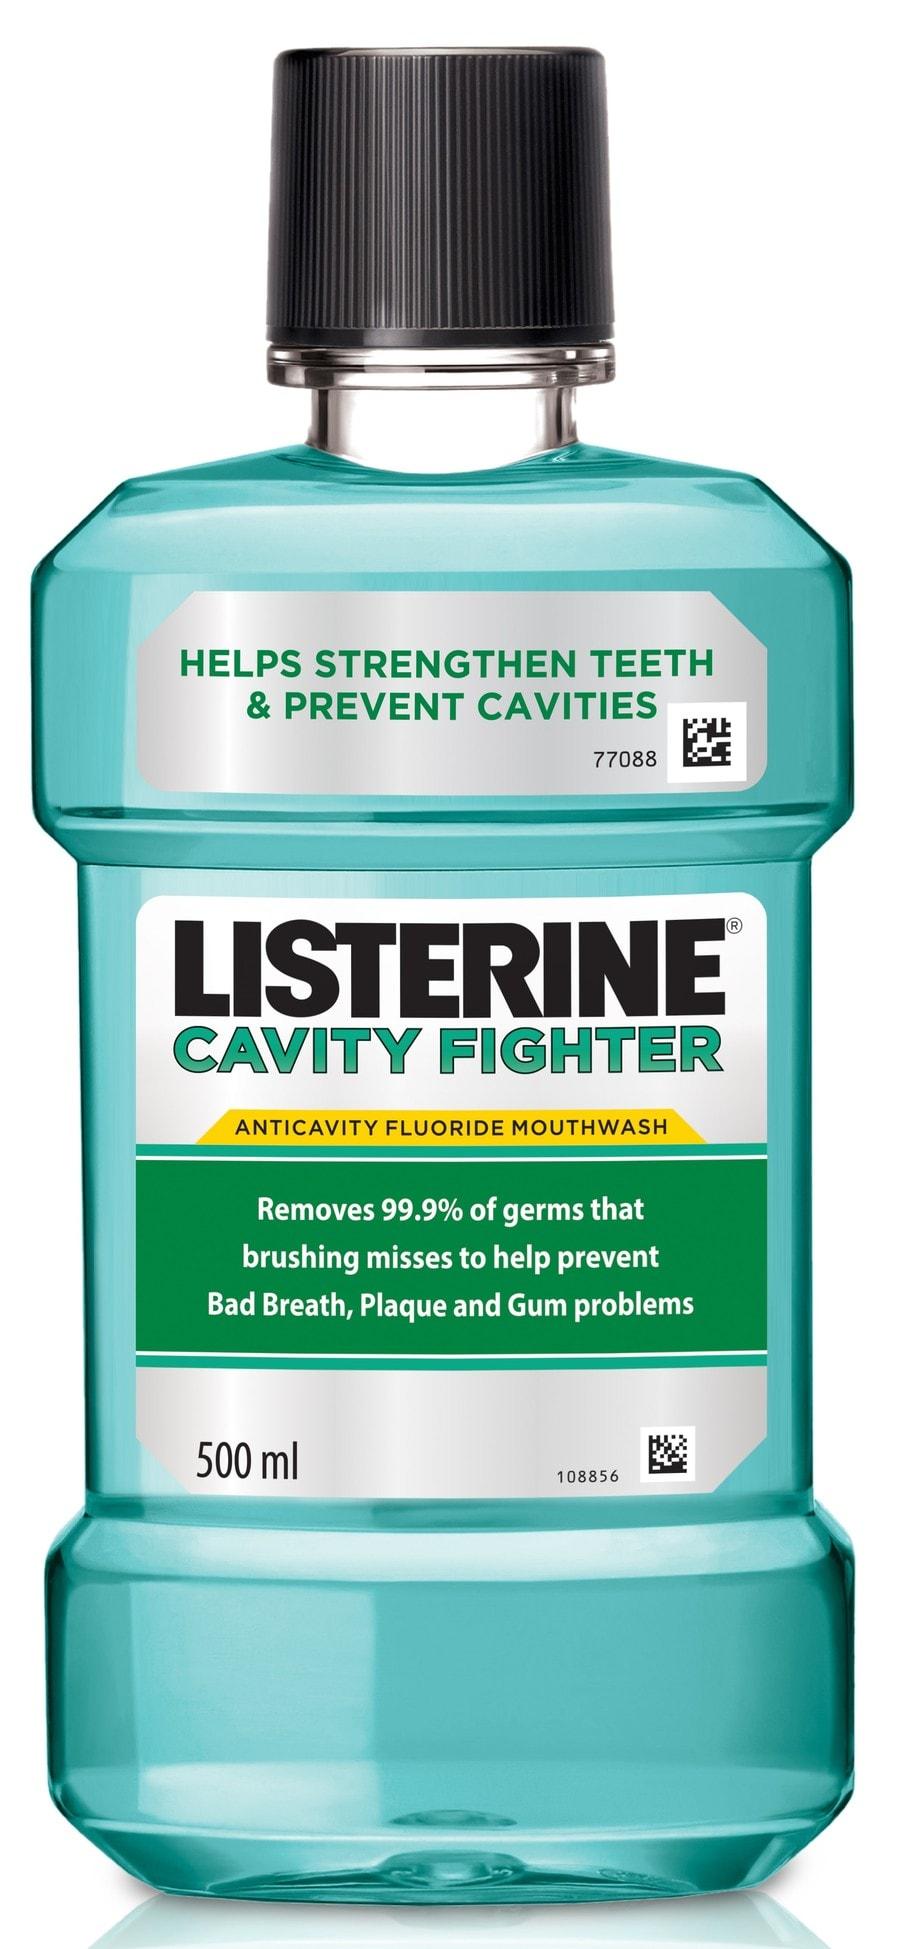 Listerine Cavity Fighter Mouthwash 500ml